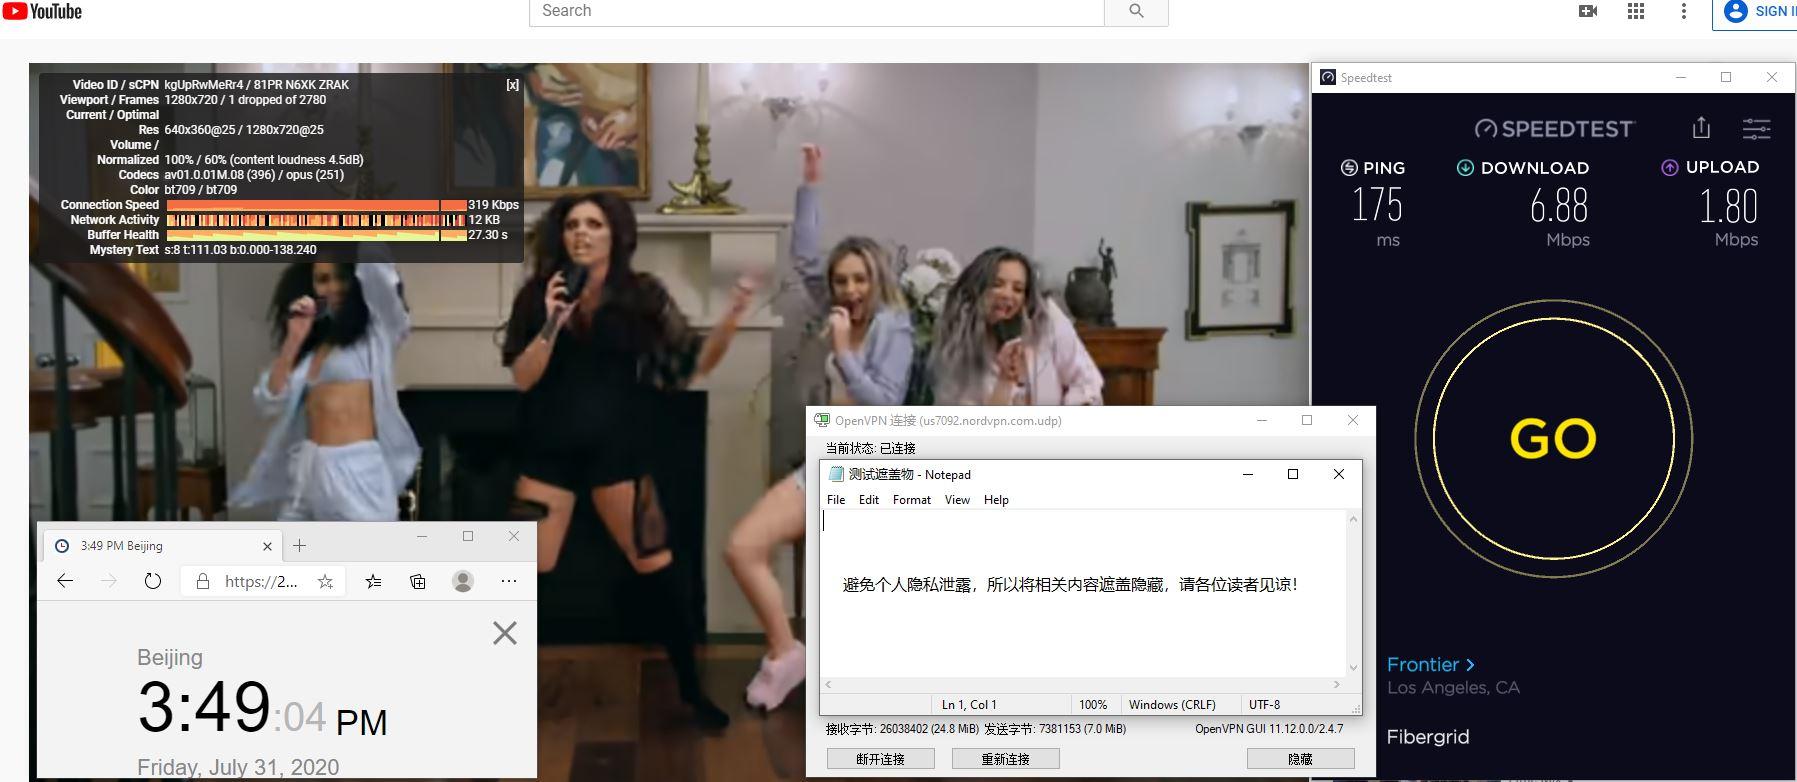 Windows10 NordVPN Openvpn us7092 中国VPN 翻墙 科学上网 翻墙速度测试 - 20200731